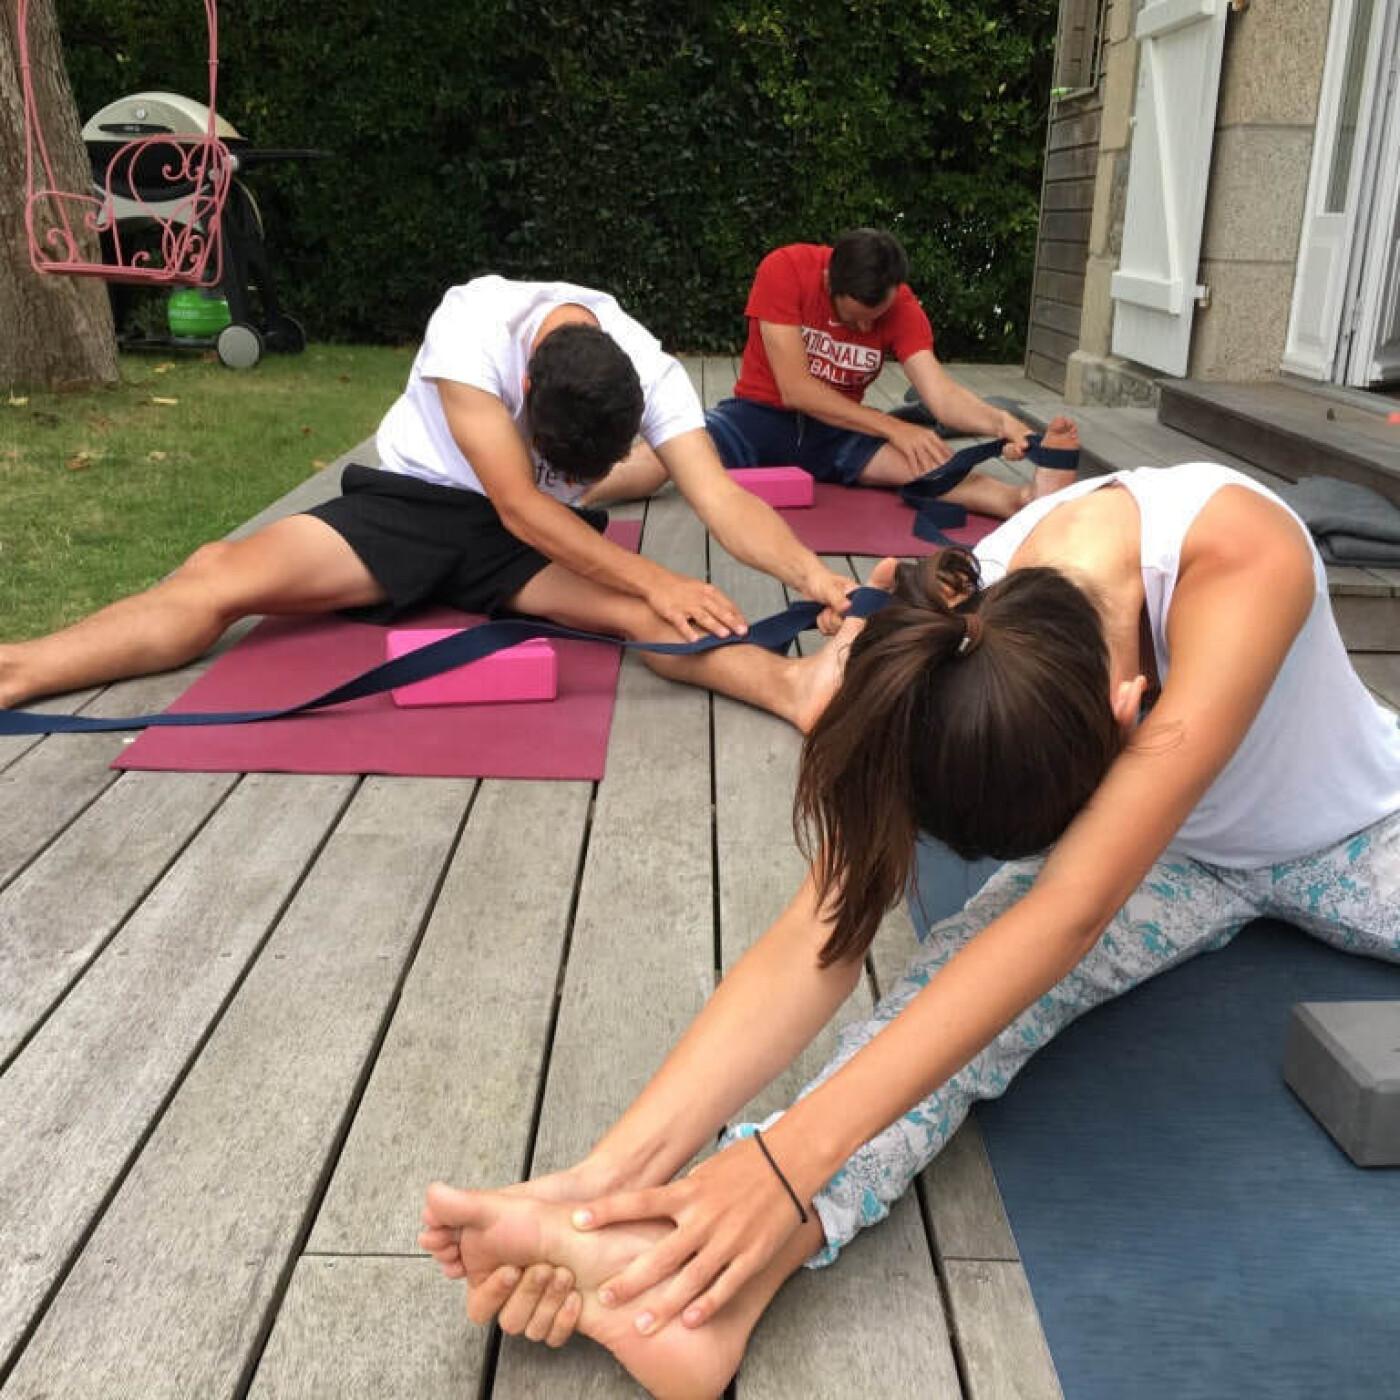 Anne, en Suisse, parle des bienfaits du Yoga - 22 06 2021 - StereoChic Radio